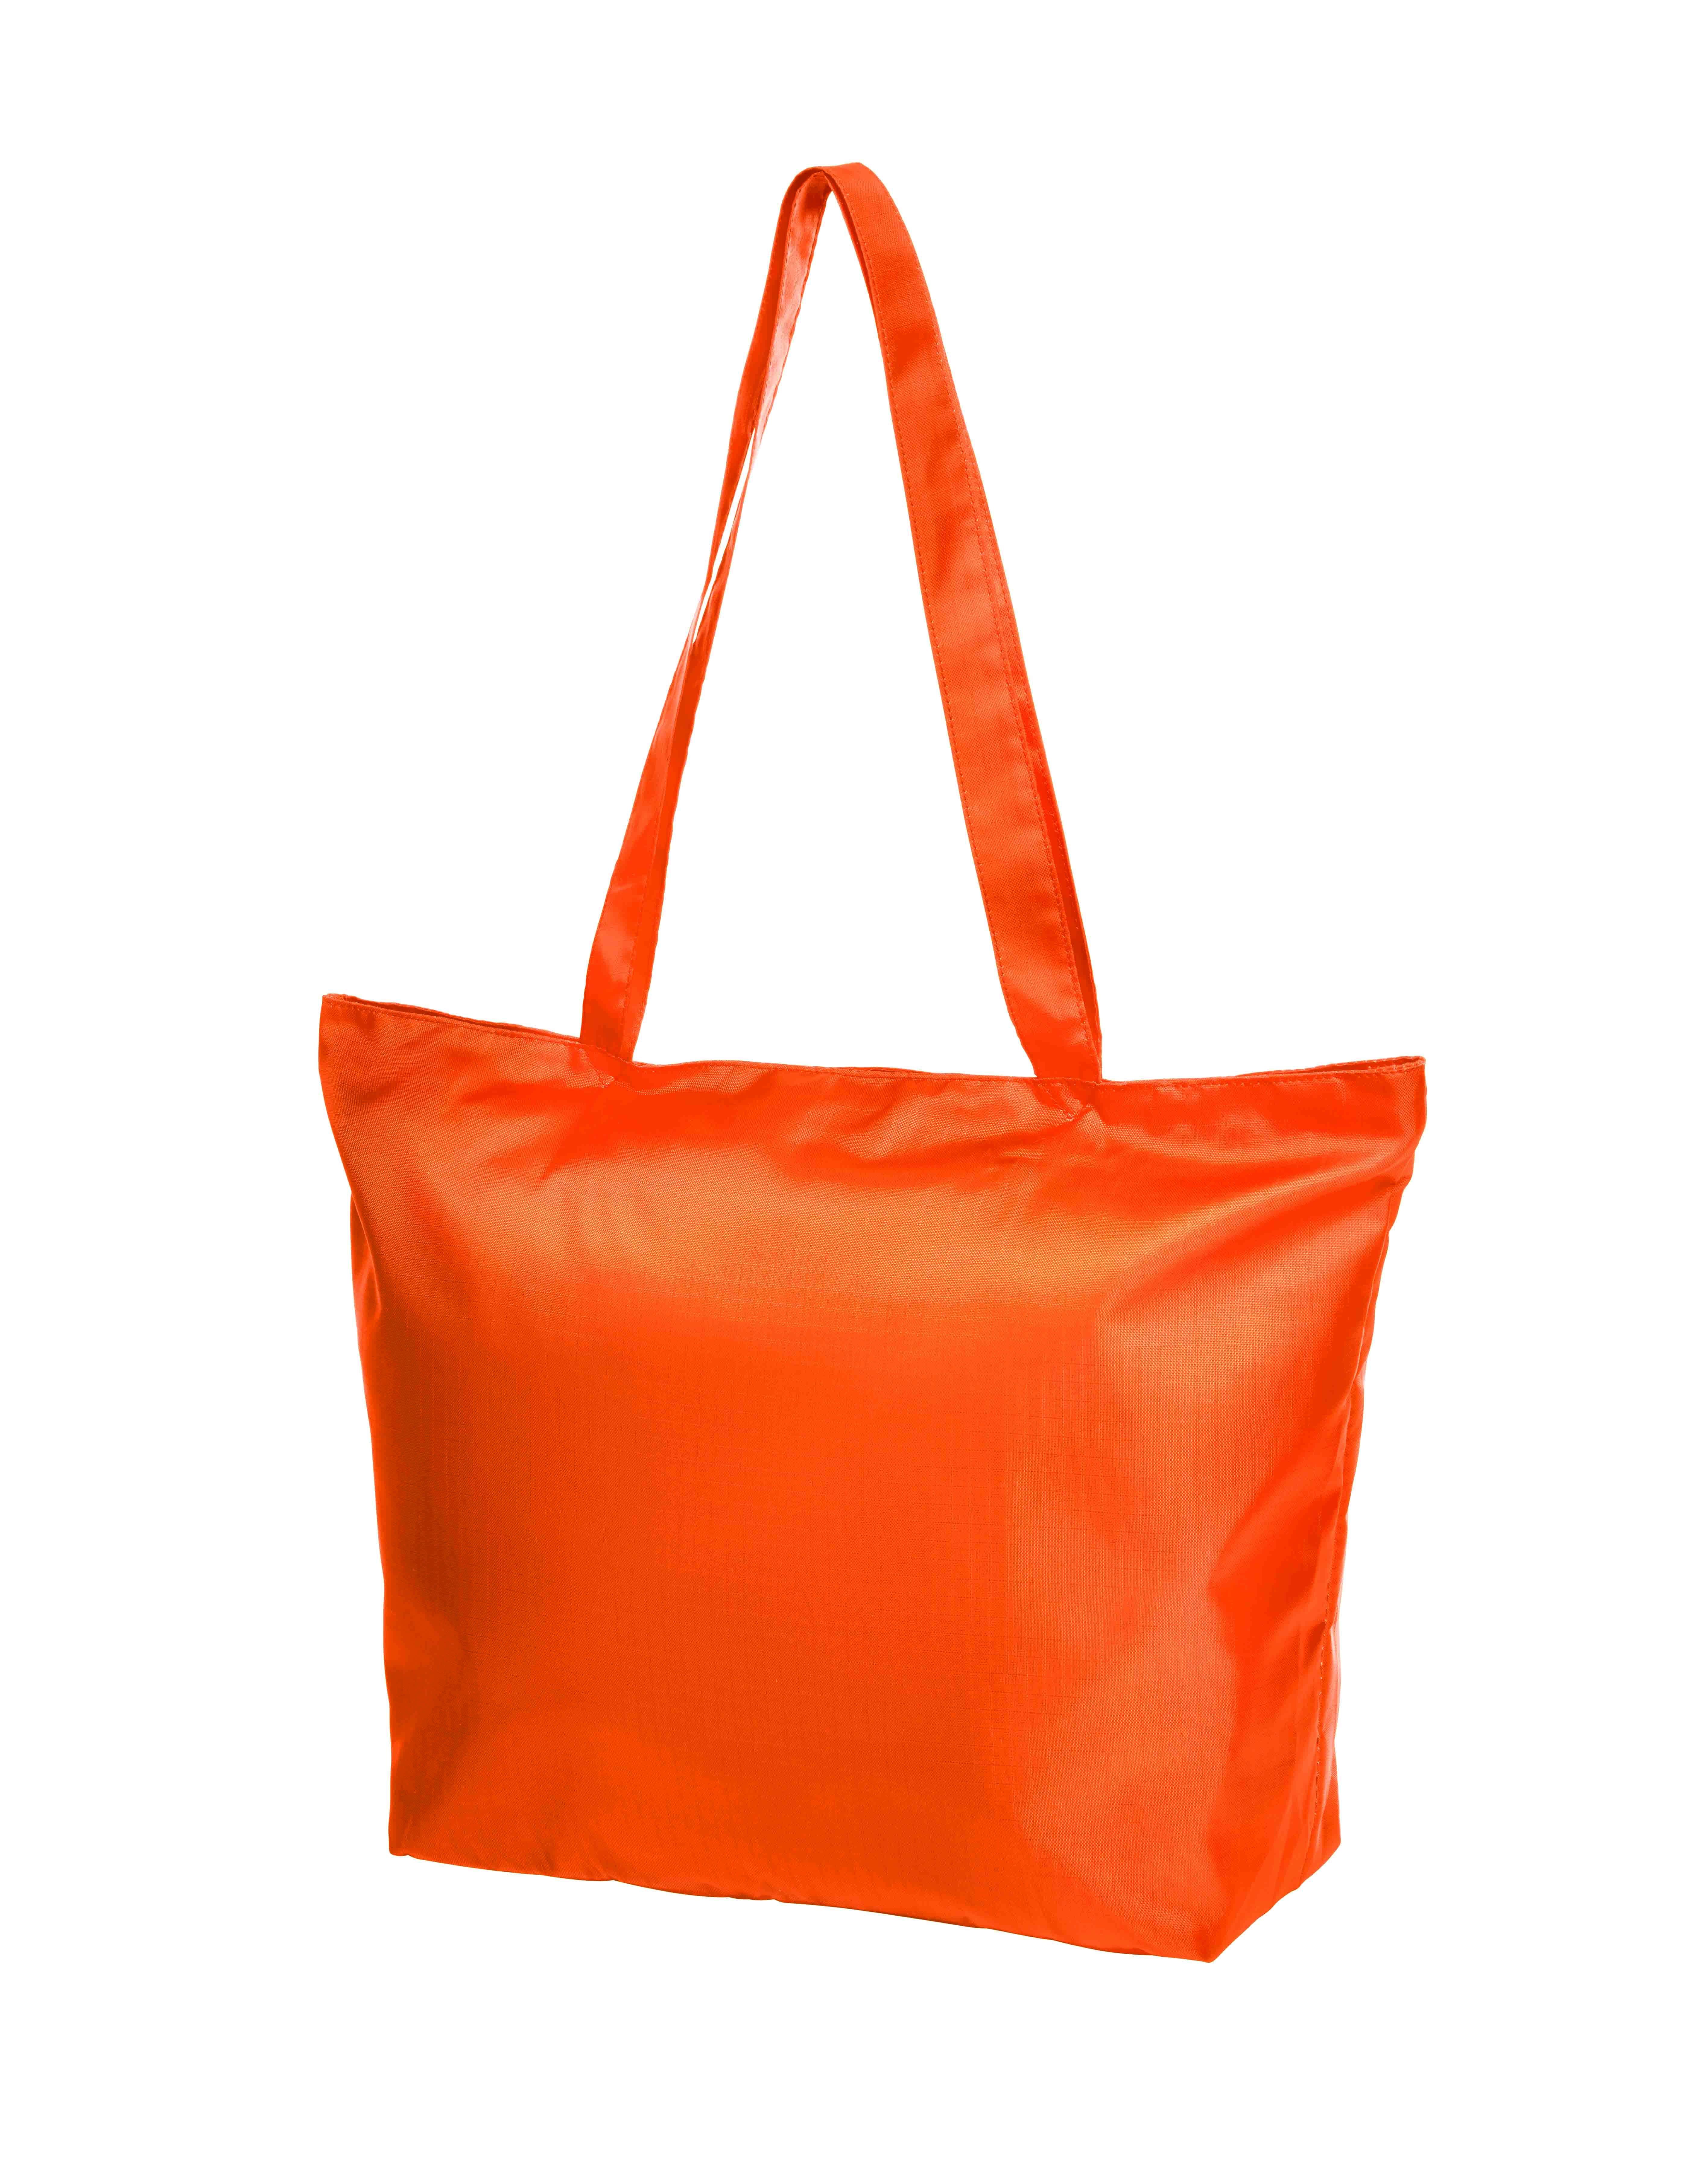 73988abec8948 Shopper Store Halfar 1814016 - Torby na zakupy